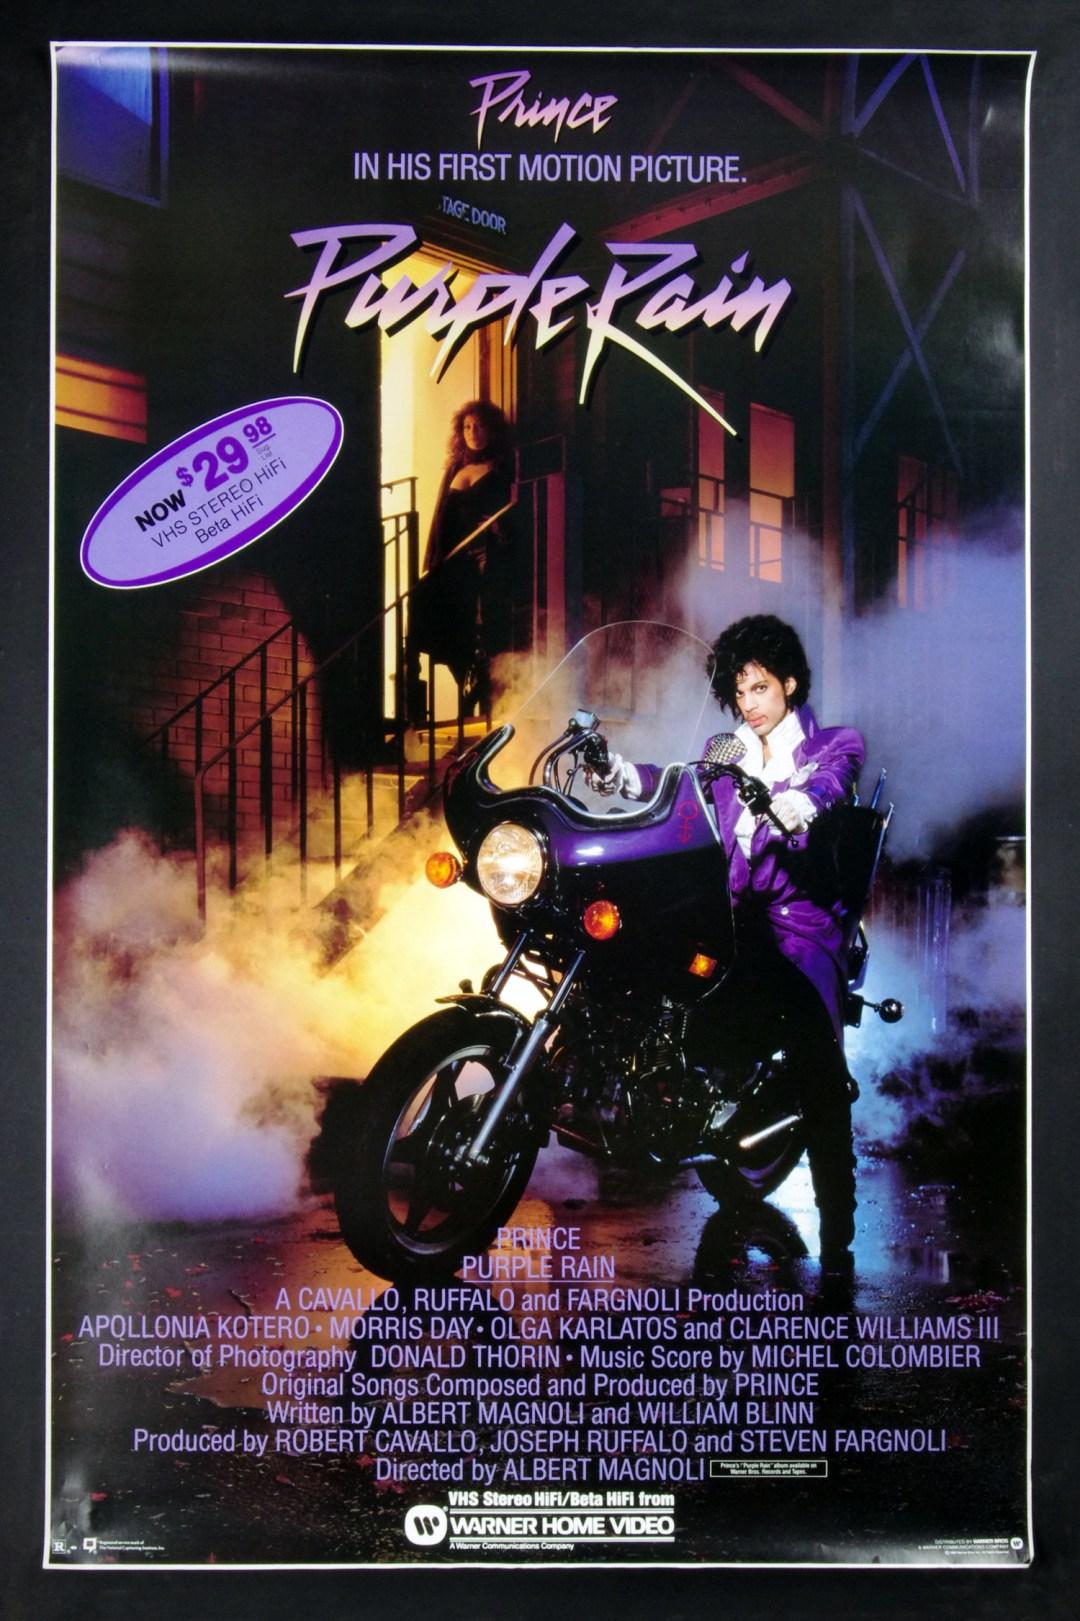 Prince Poster Purple Rain 1984 Movie Home Video Promo 27 x 39